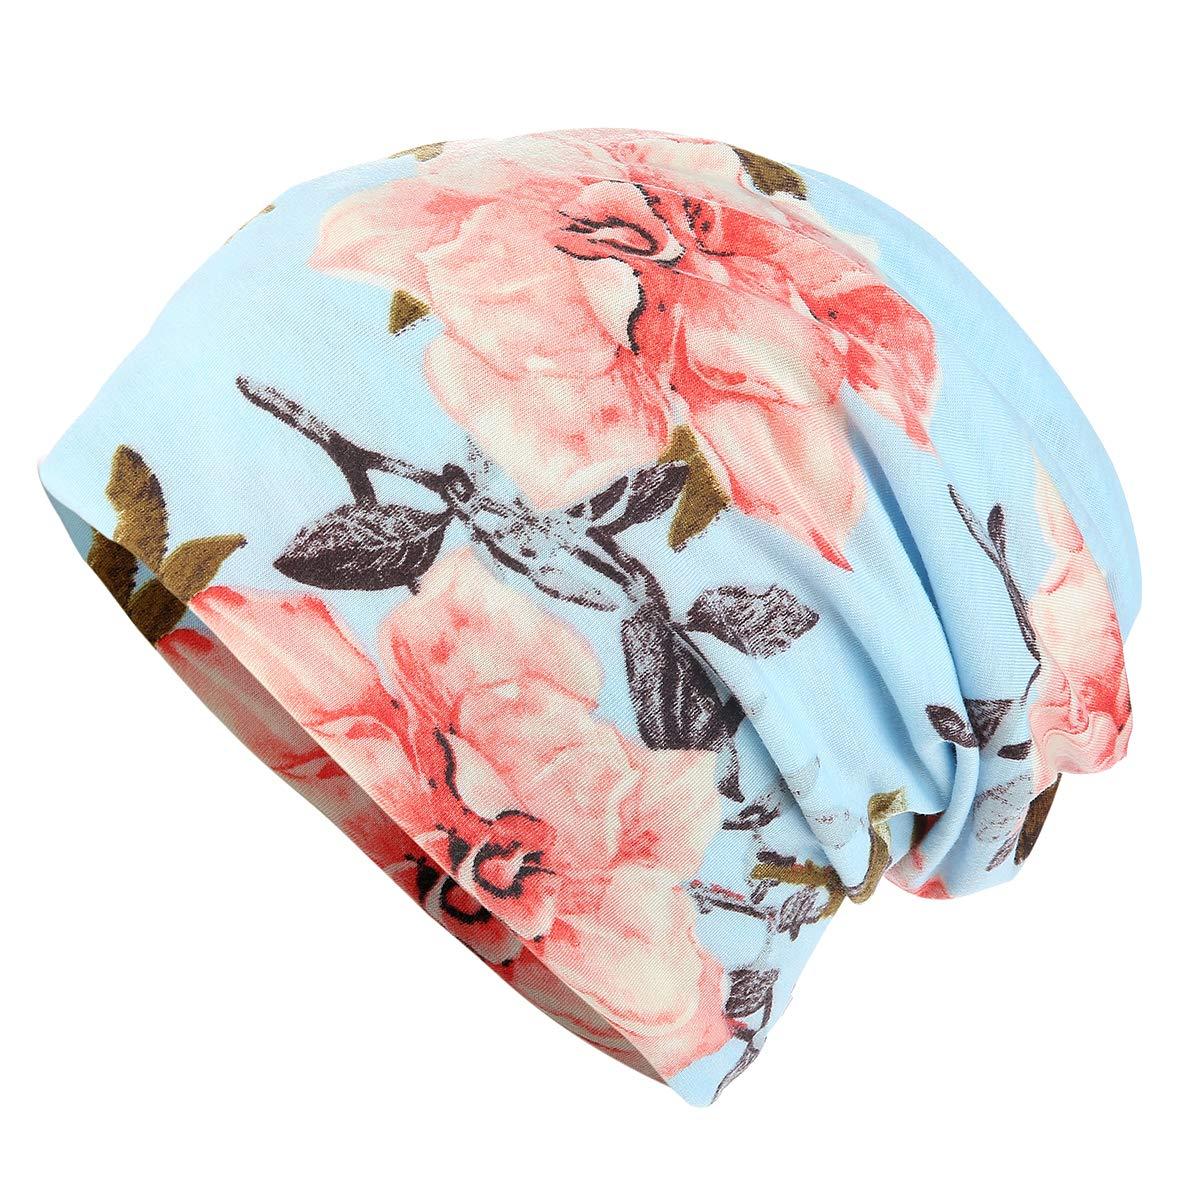 HONENNA Flower Printed Cotton Beanie Women Turban Headband Chemo Cap